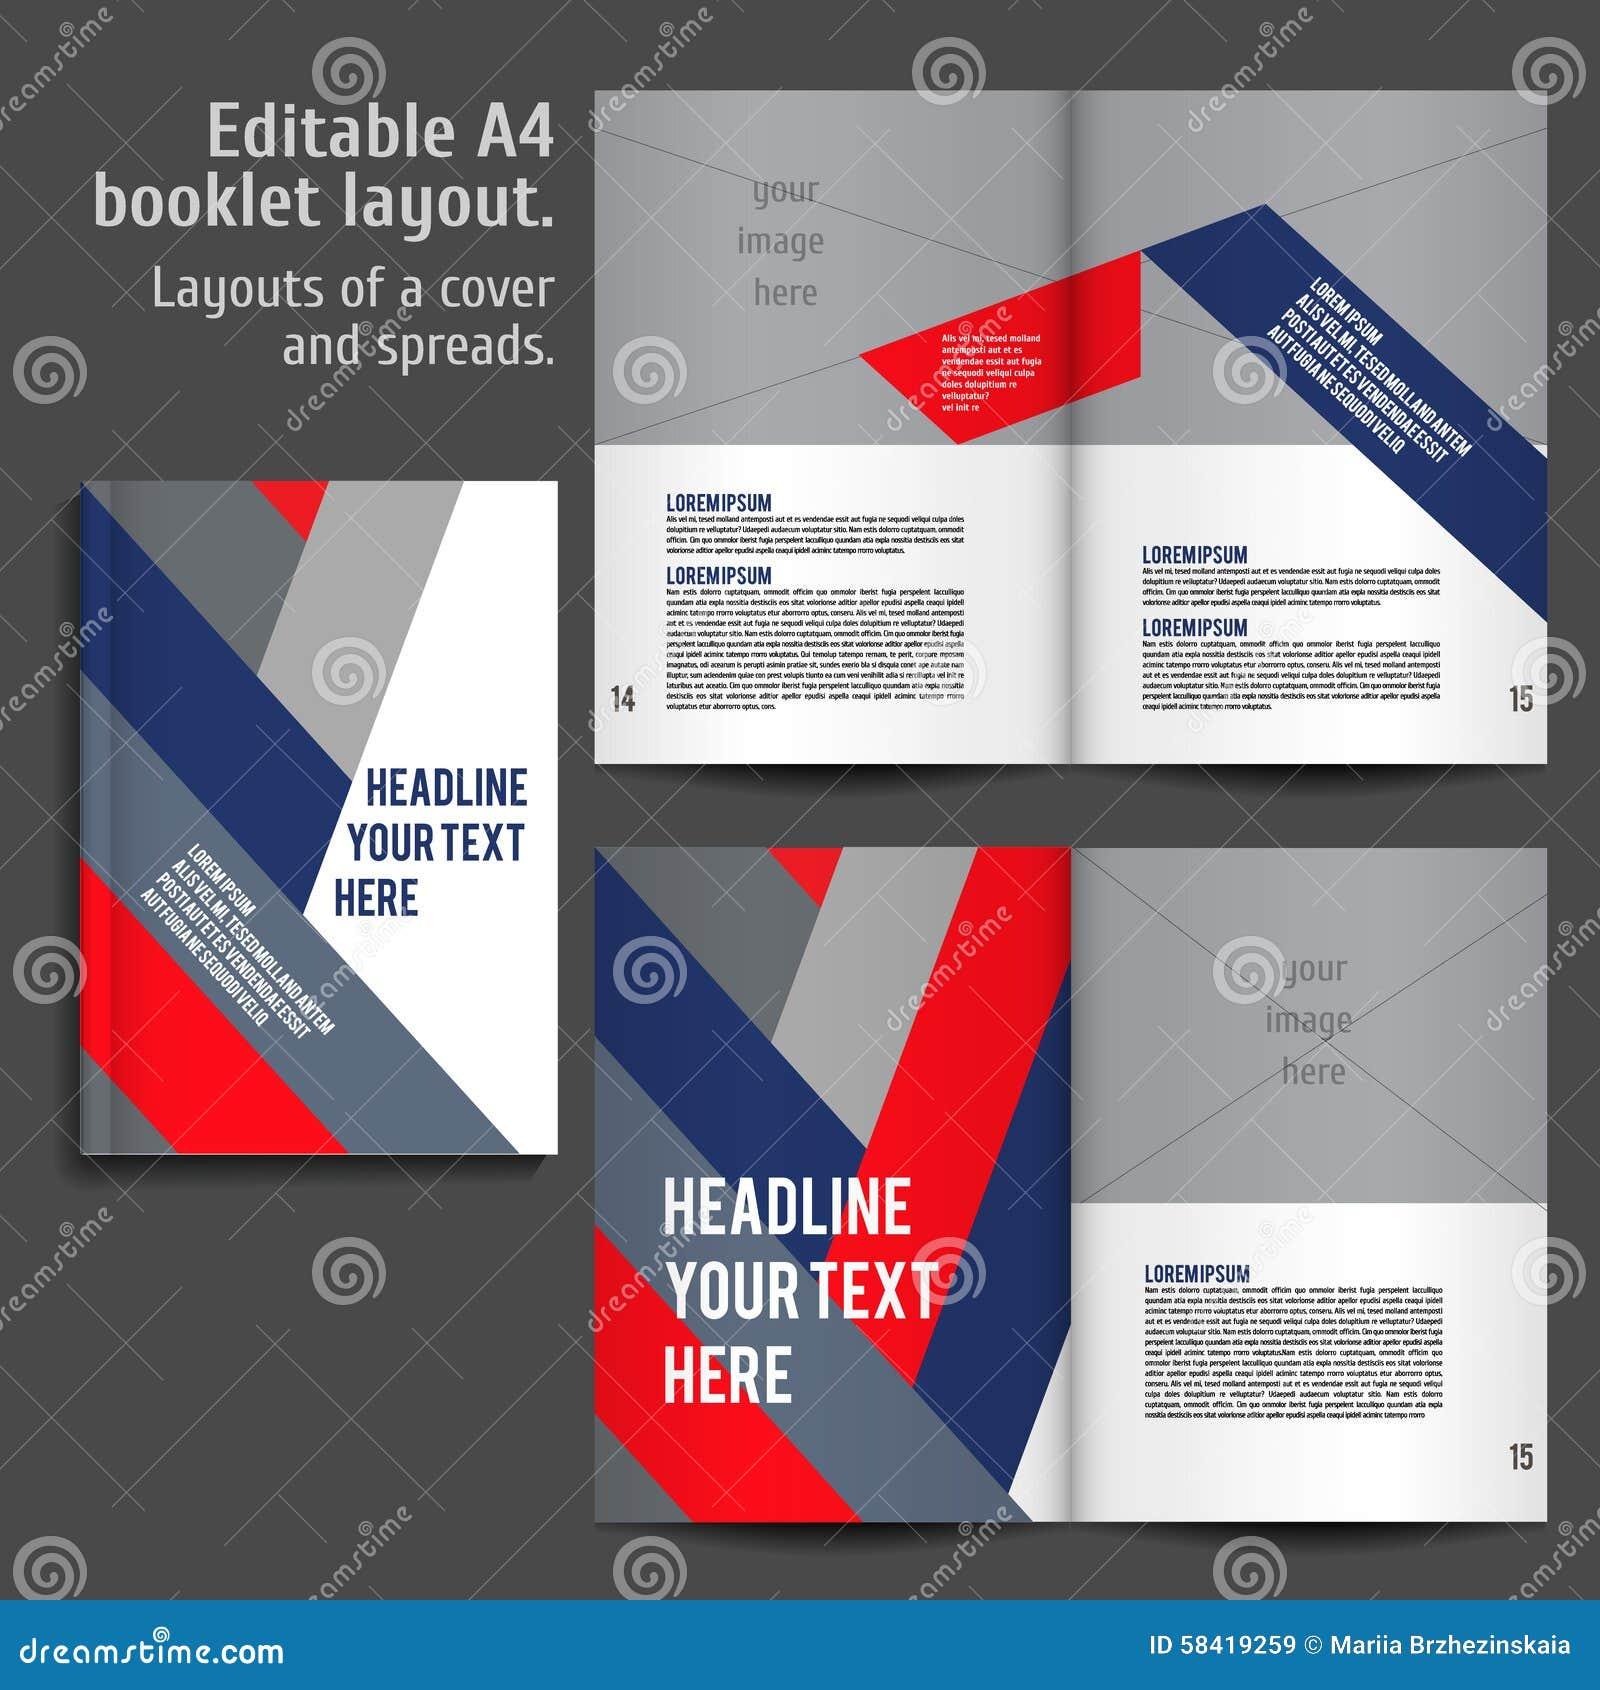 Inspire Book Design Template Youtube